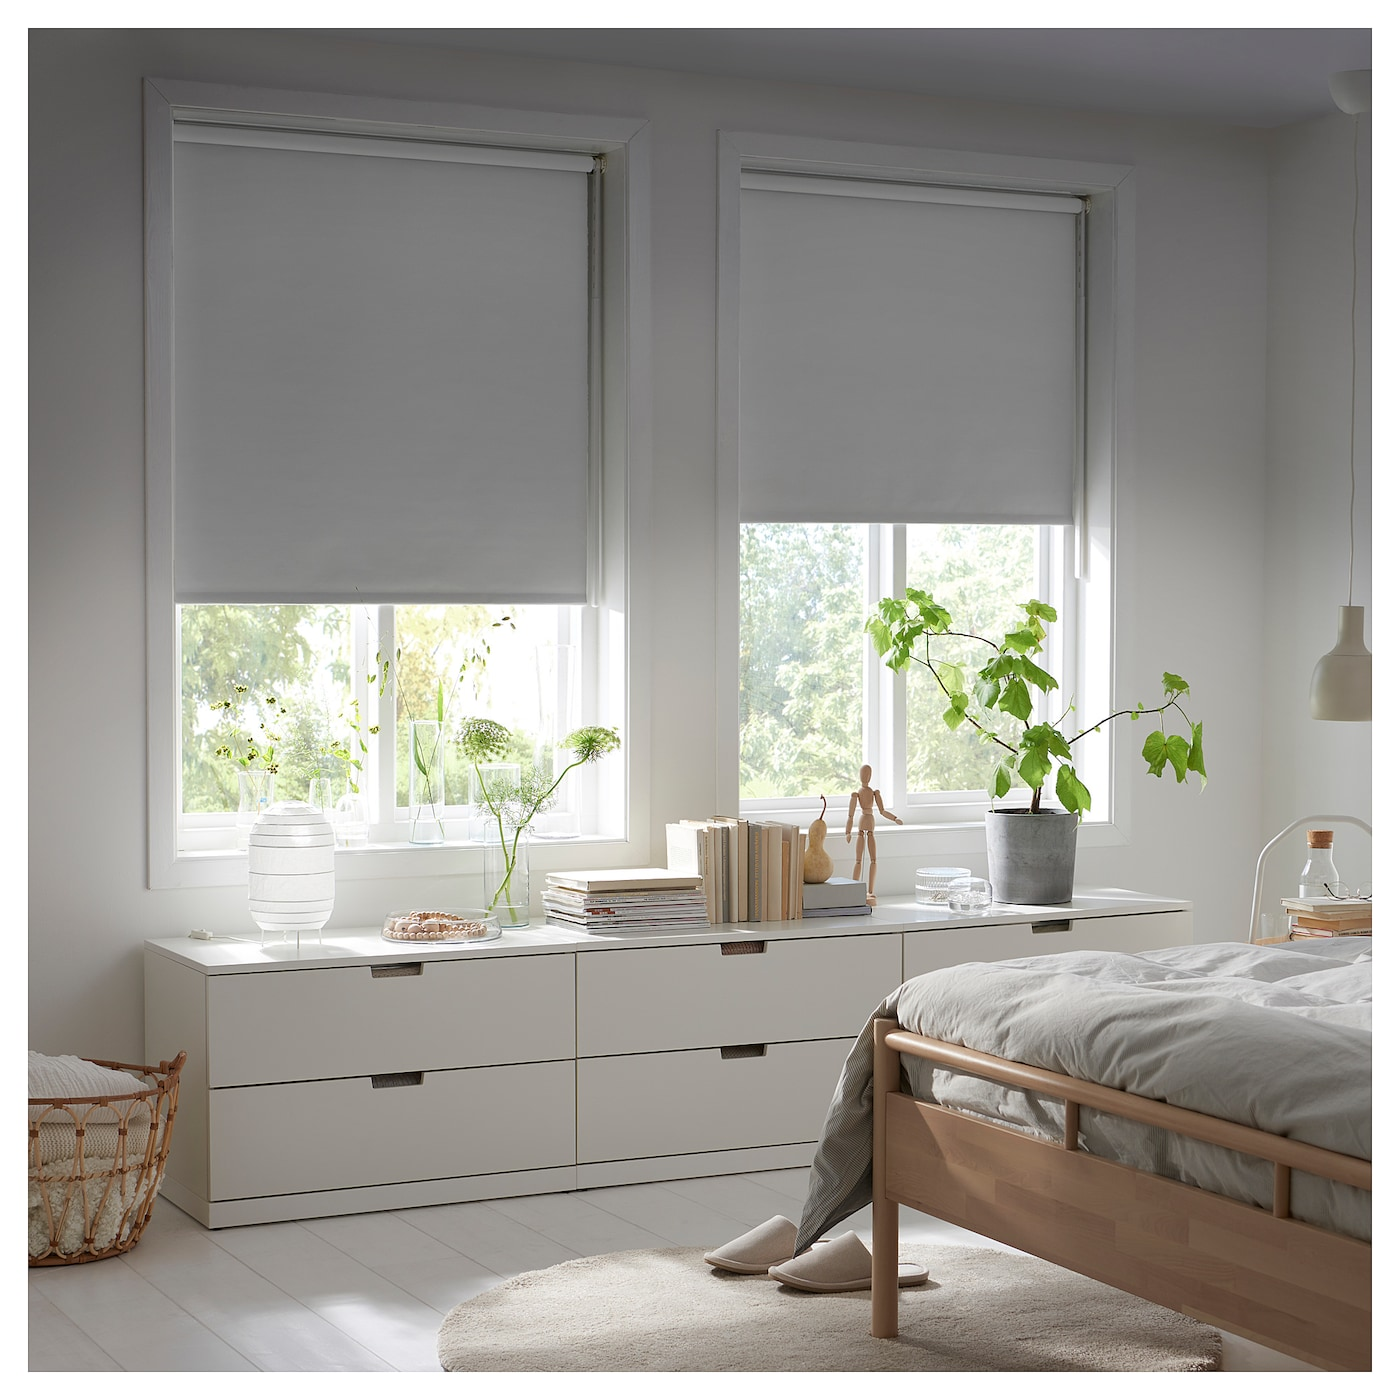 FRIDANS Lystett rullegardin, grå, 60x195 cm